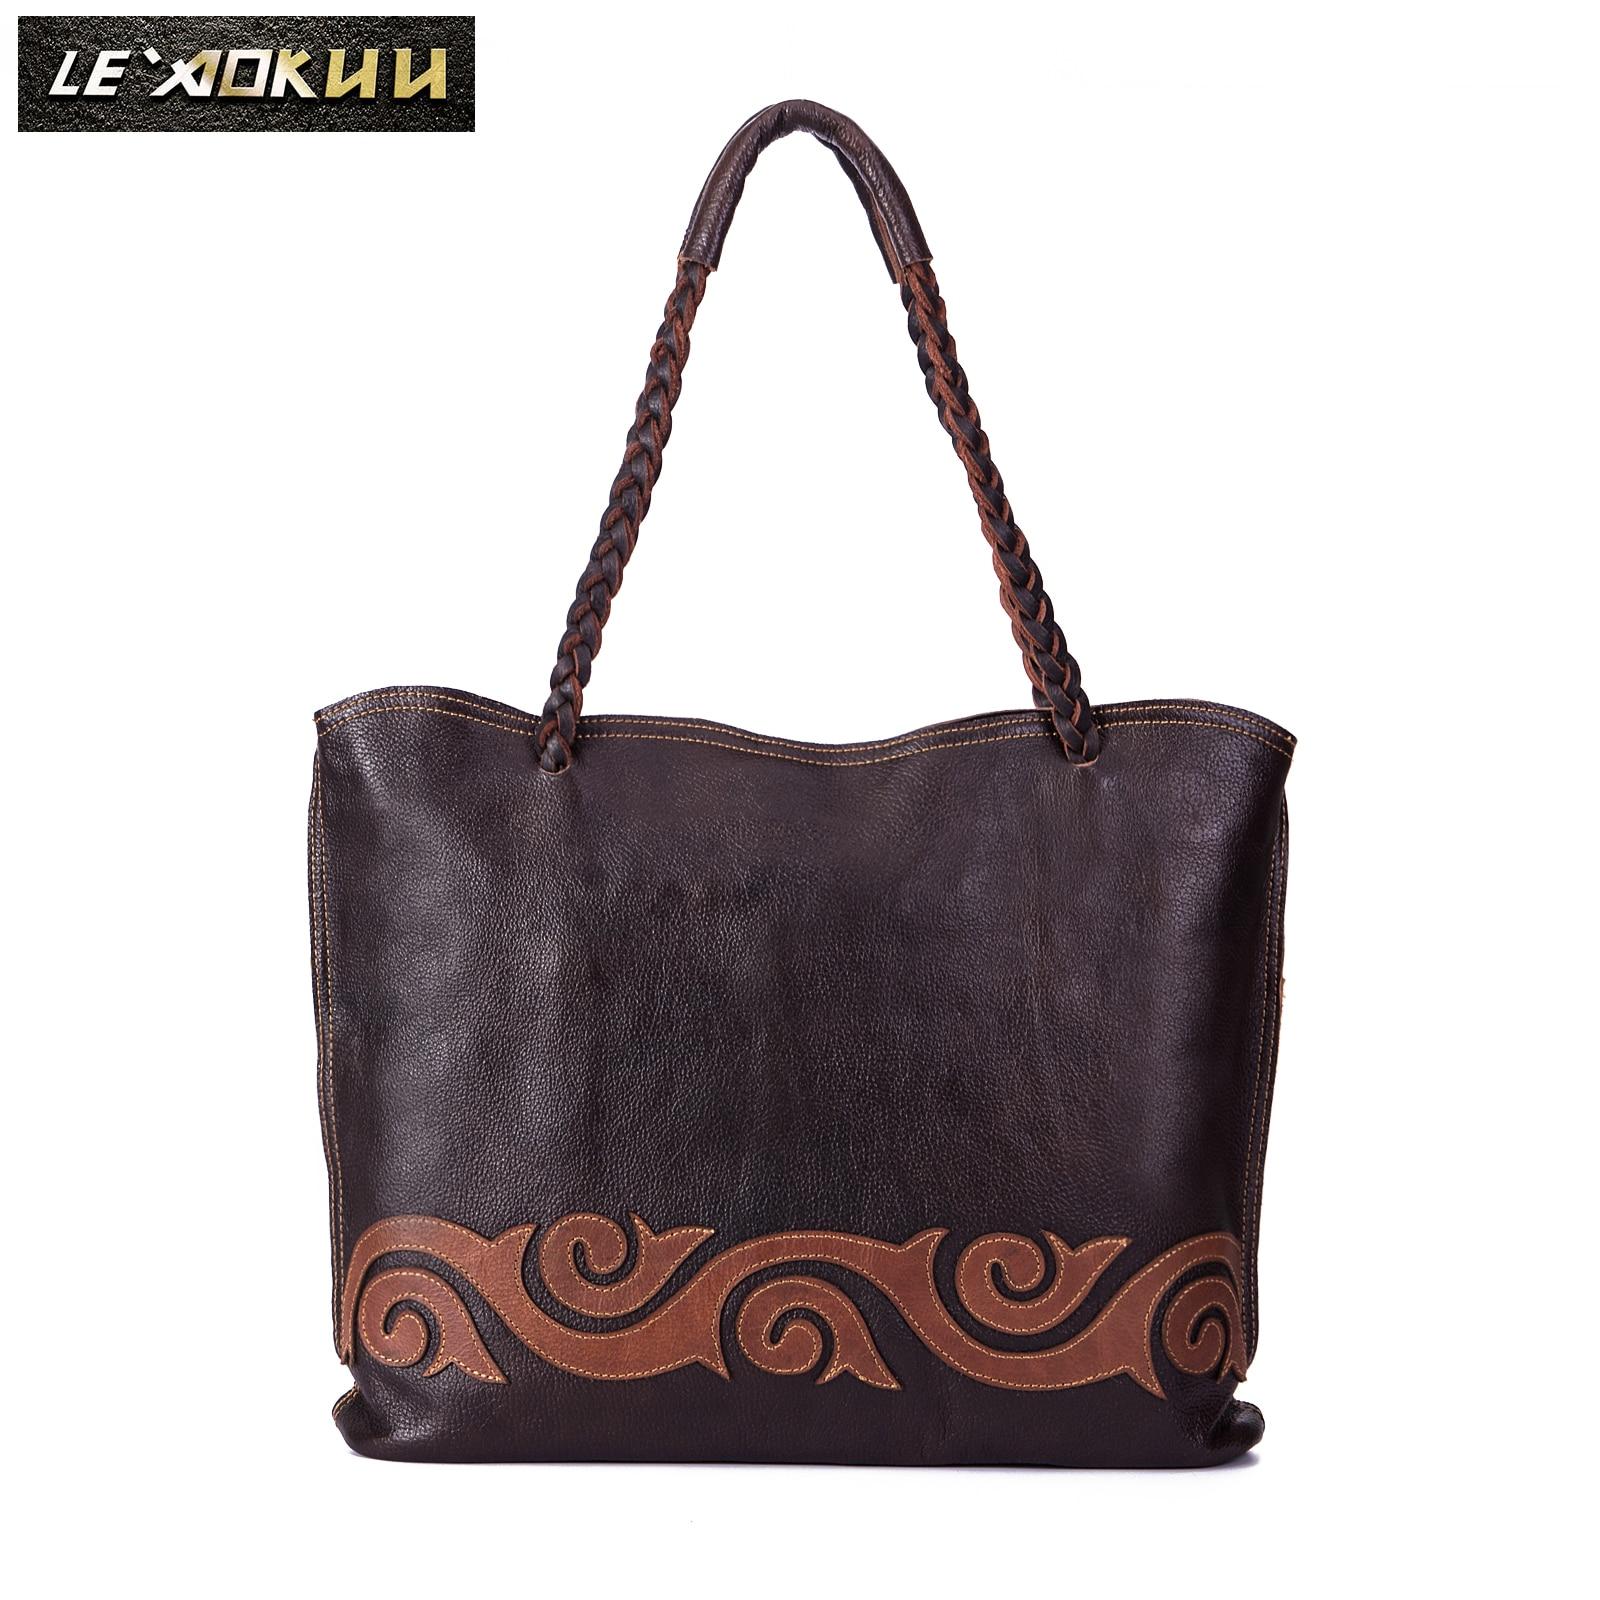 Soft Quality Leather Famous Brand Luxury Ladies Large Shopping handbag Shoulder bag Women Designer f